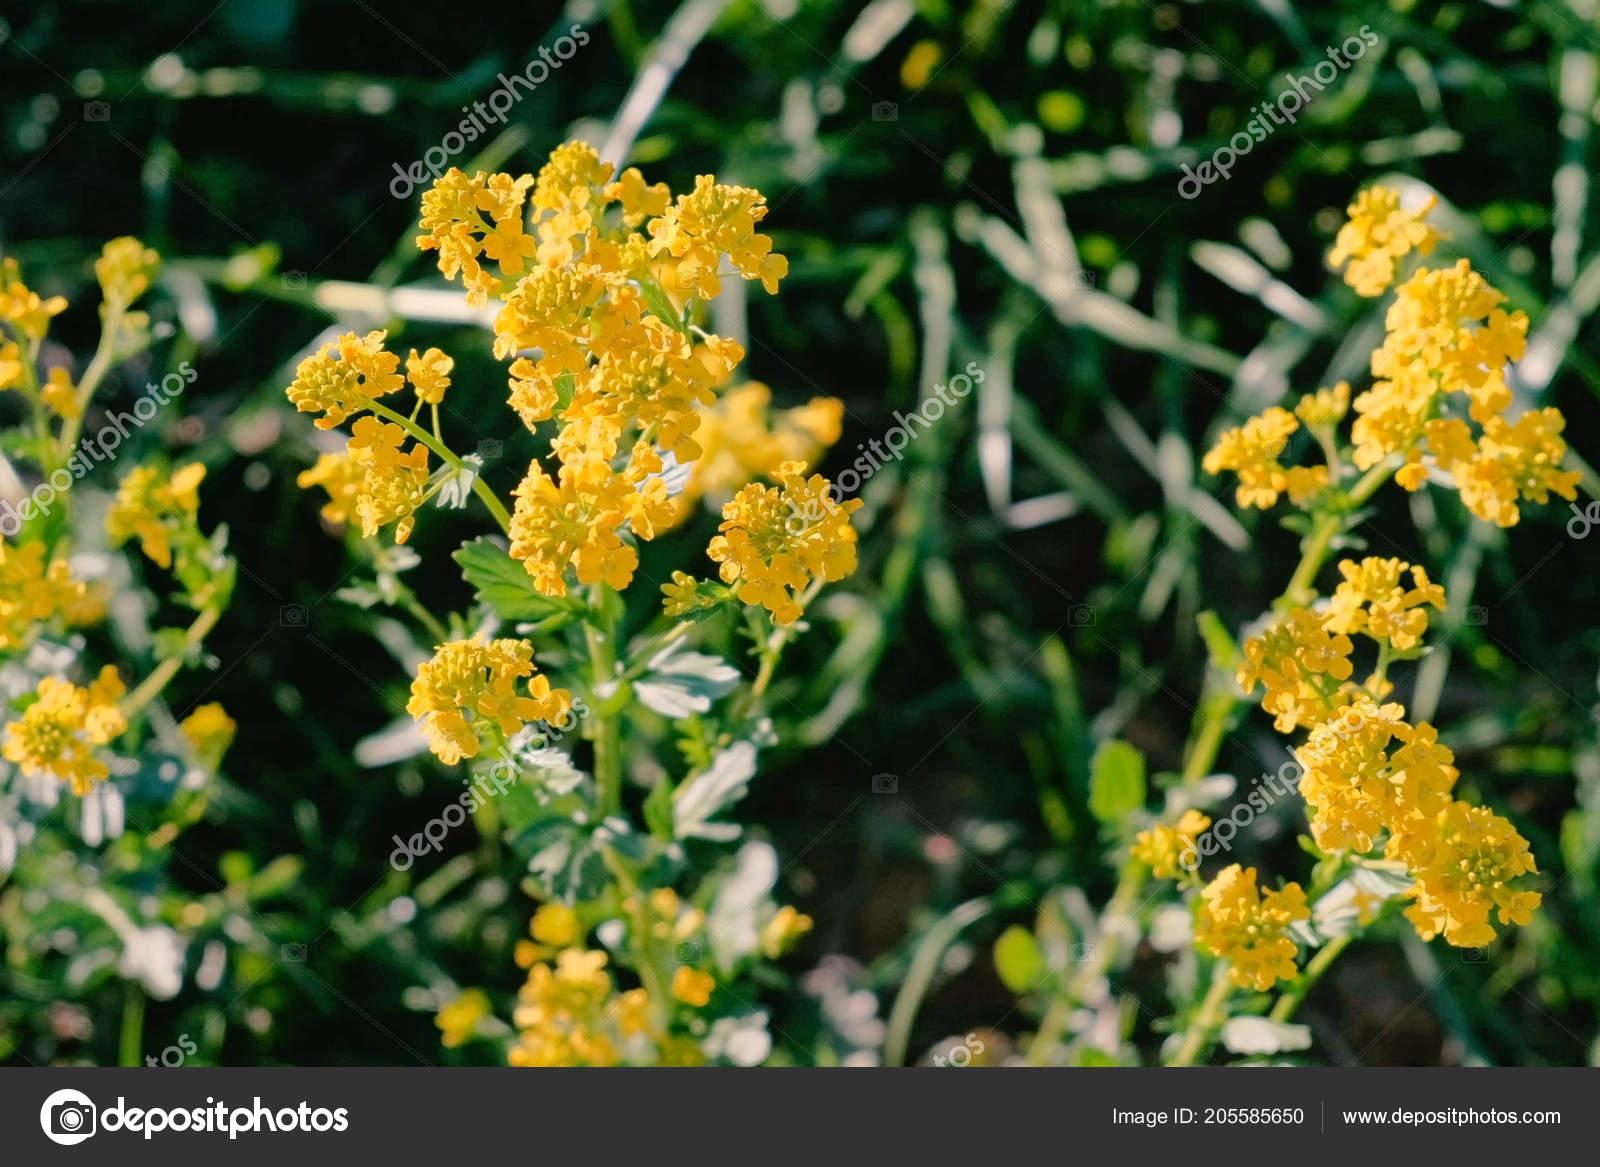 Come Si Chiamano I Fiori Gialli.Yellow Small Flowers In A Meadow Close Up Stock Photo